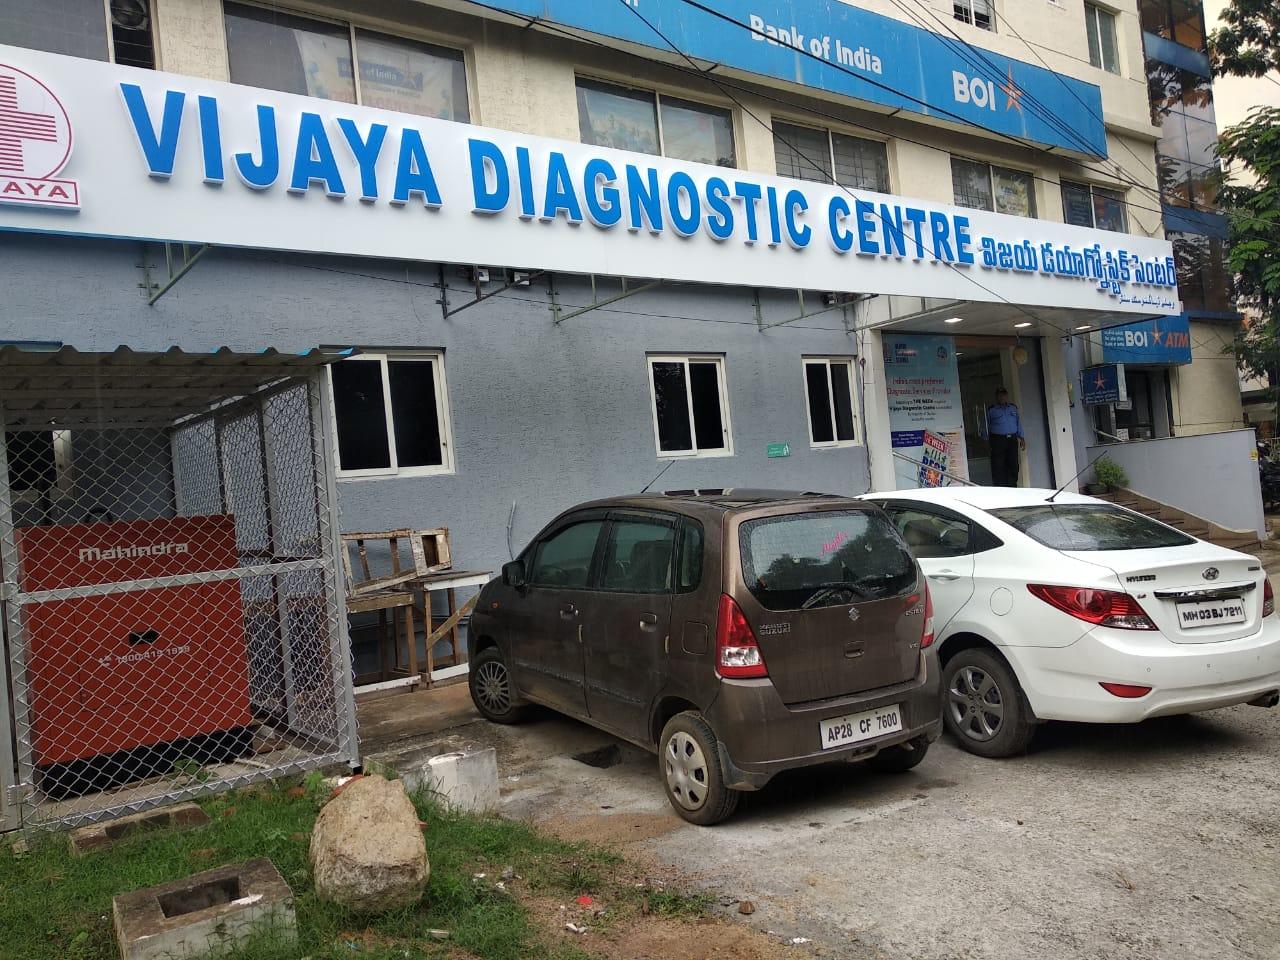 blood bank Vijaya Diagnostic Centre, KPHB Phase 6 near Hyderabad Telangana